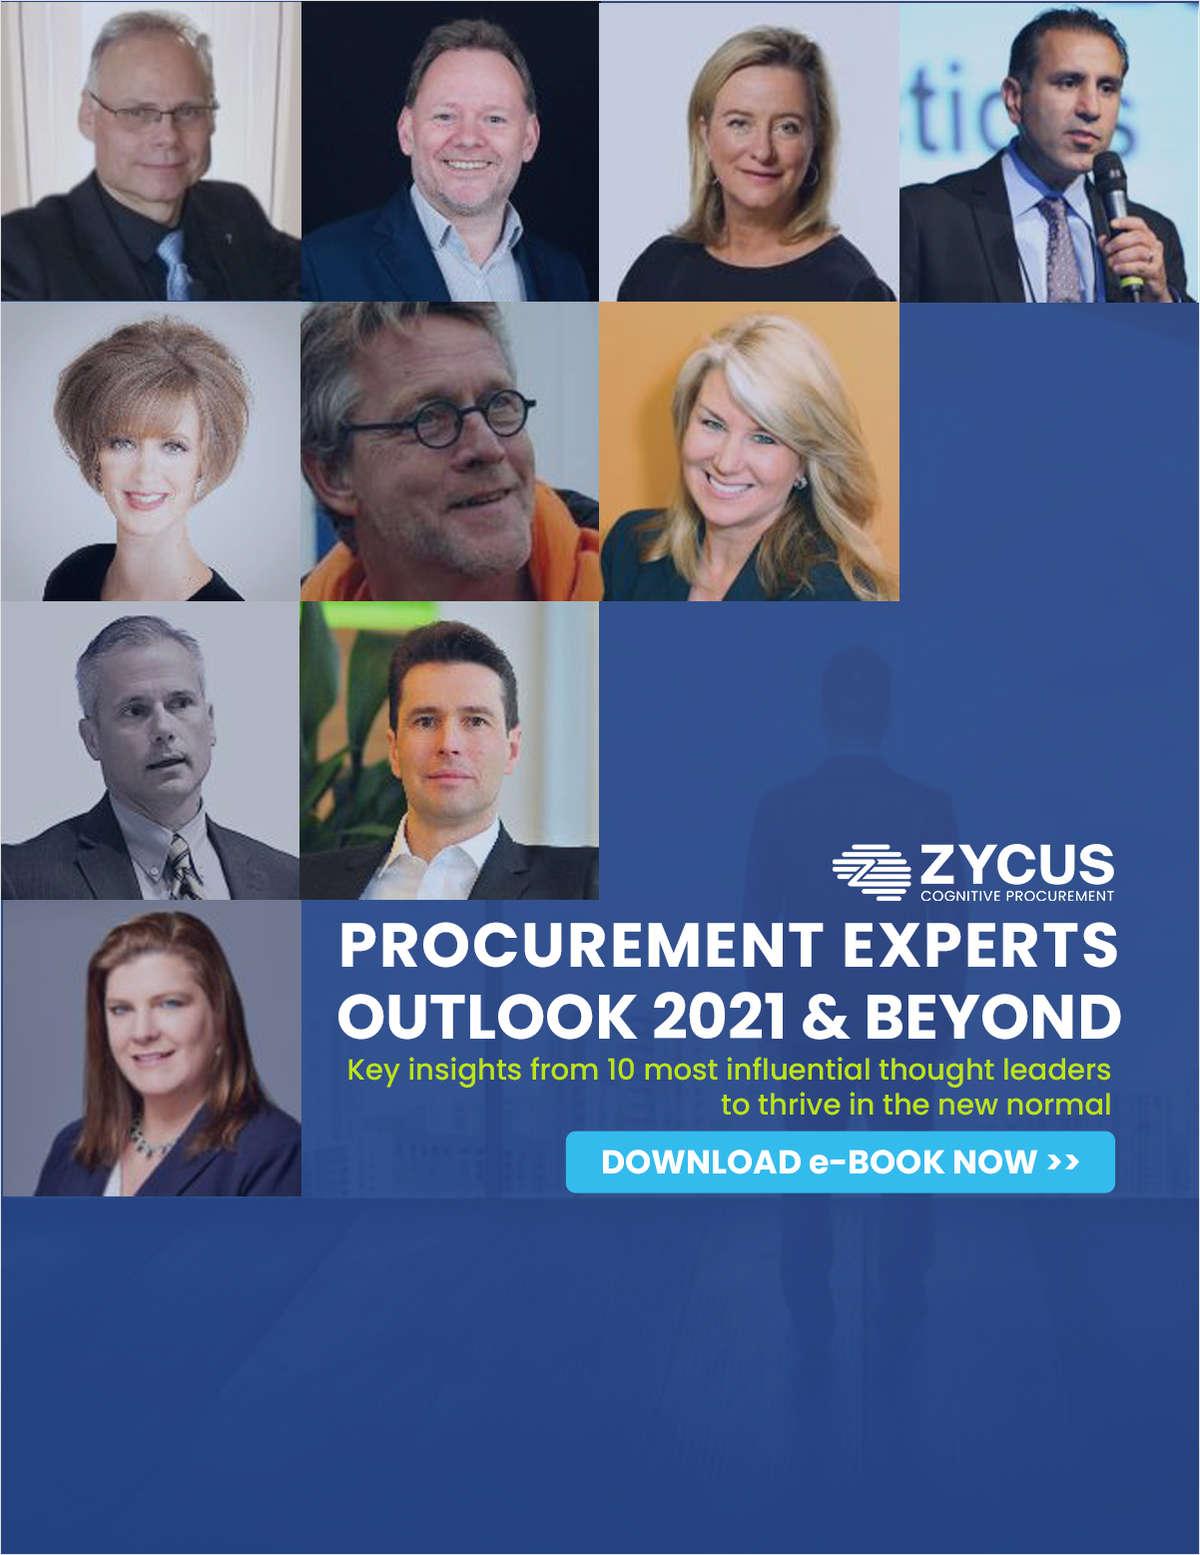 Procurement Experts Outlook 2021 & Beyond